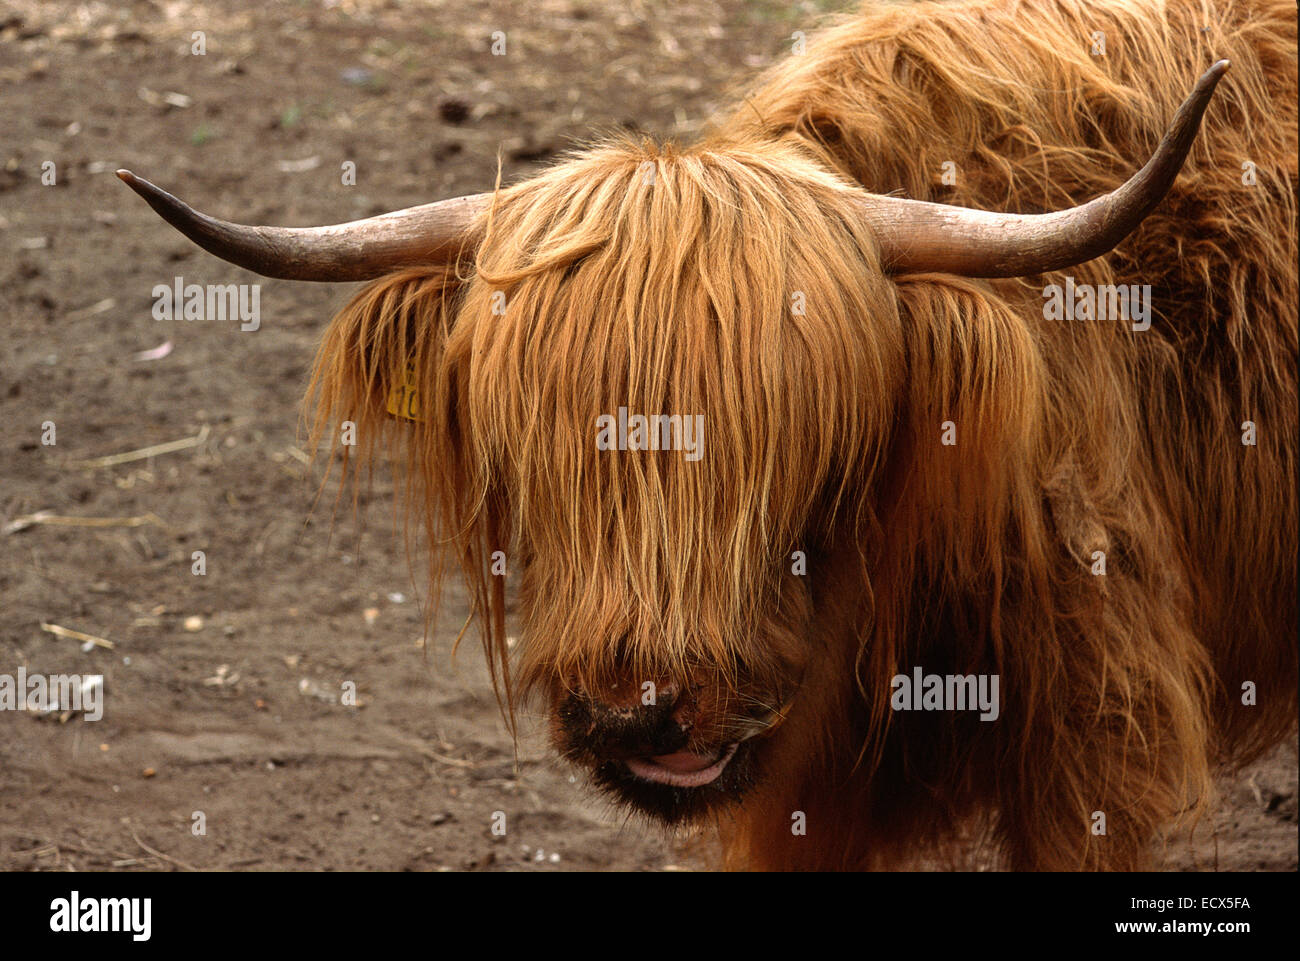 Highland Cattle (Bos Taurus), Horntiere, Schottland, Europa Stockfoto